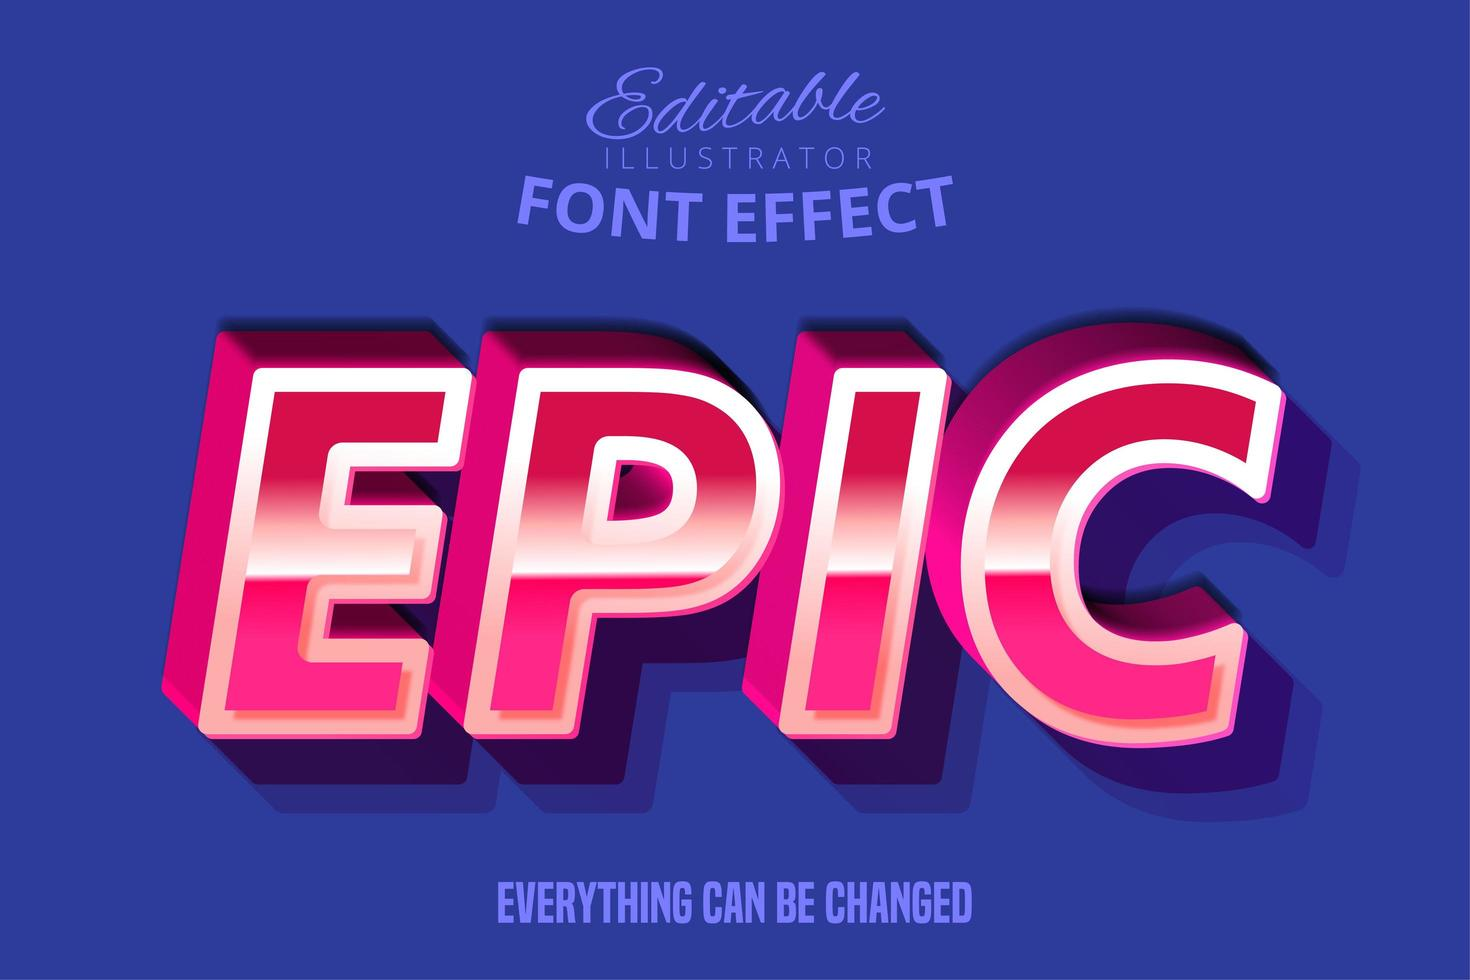 Editierbarer Typografie-Gusseffekt des modernen Retro Skriptes vektor